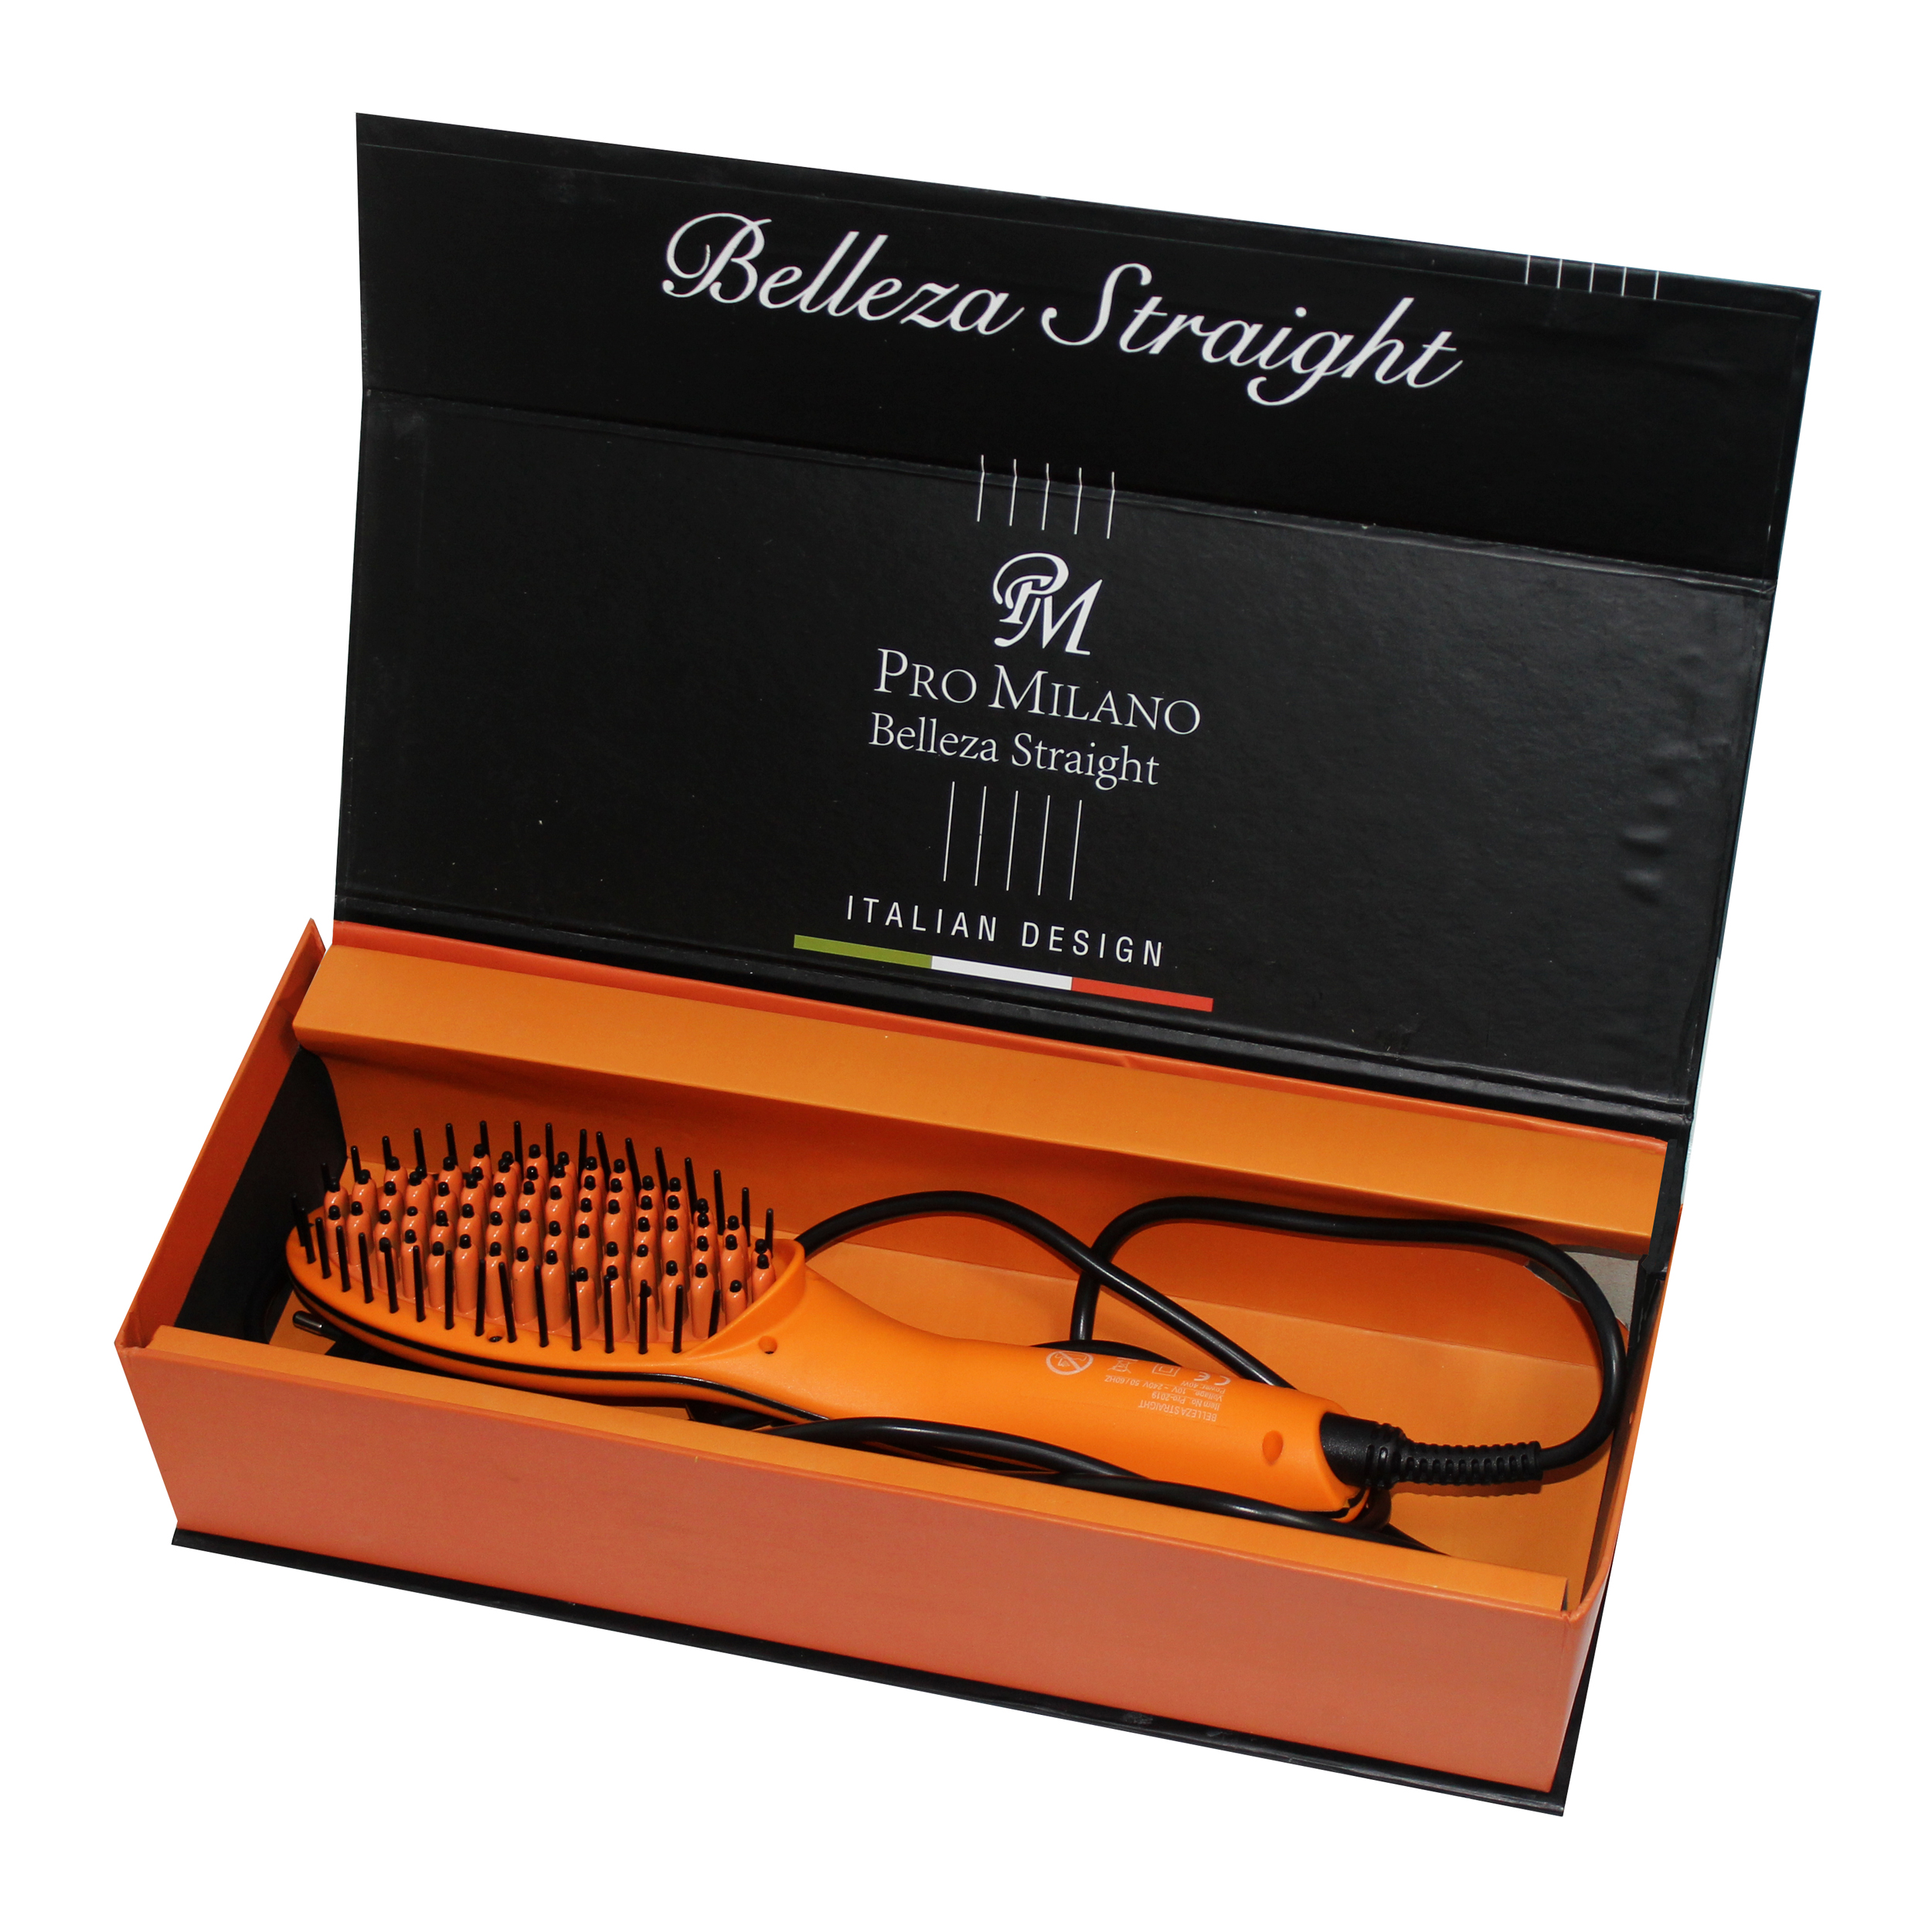 IGIA Women's Professional Milano Hair Straightening Brush Comb -Orange